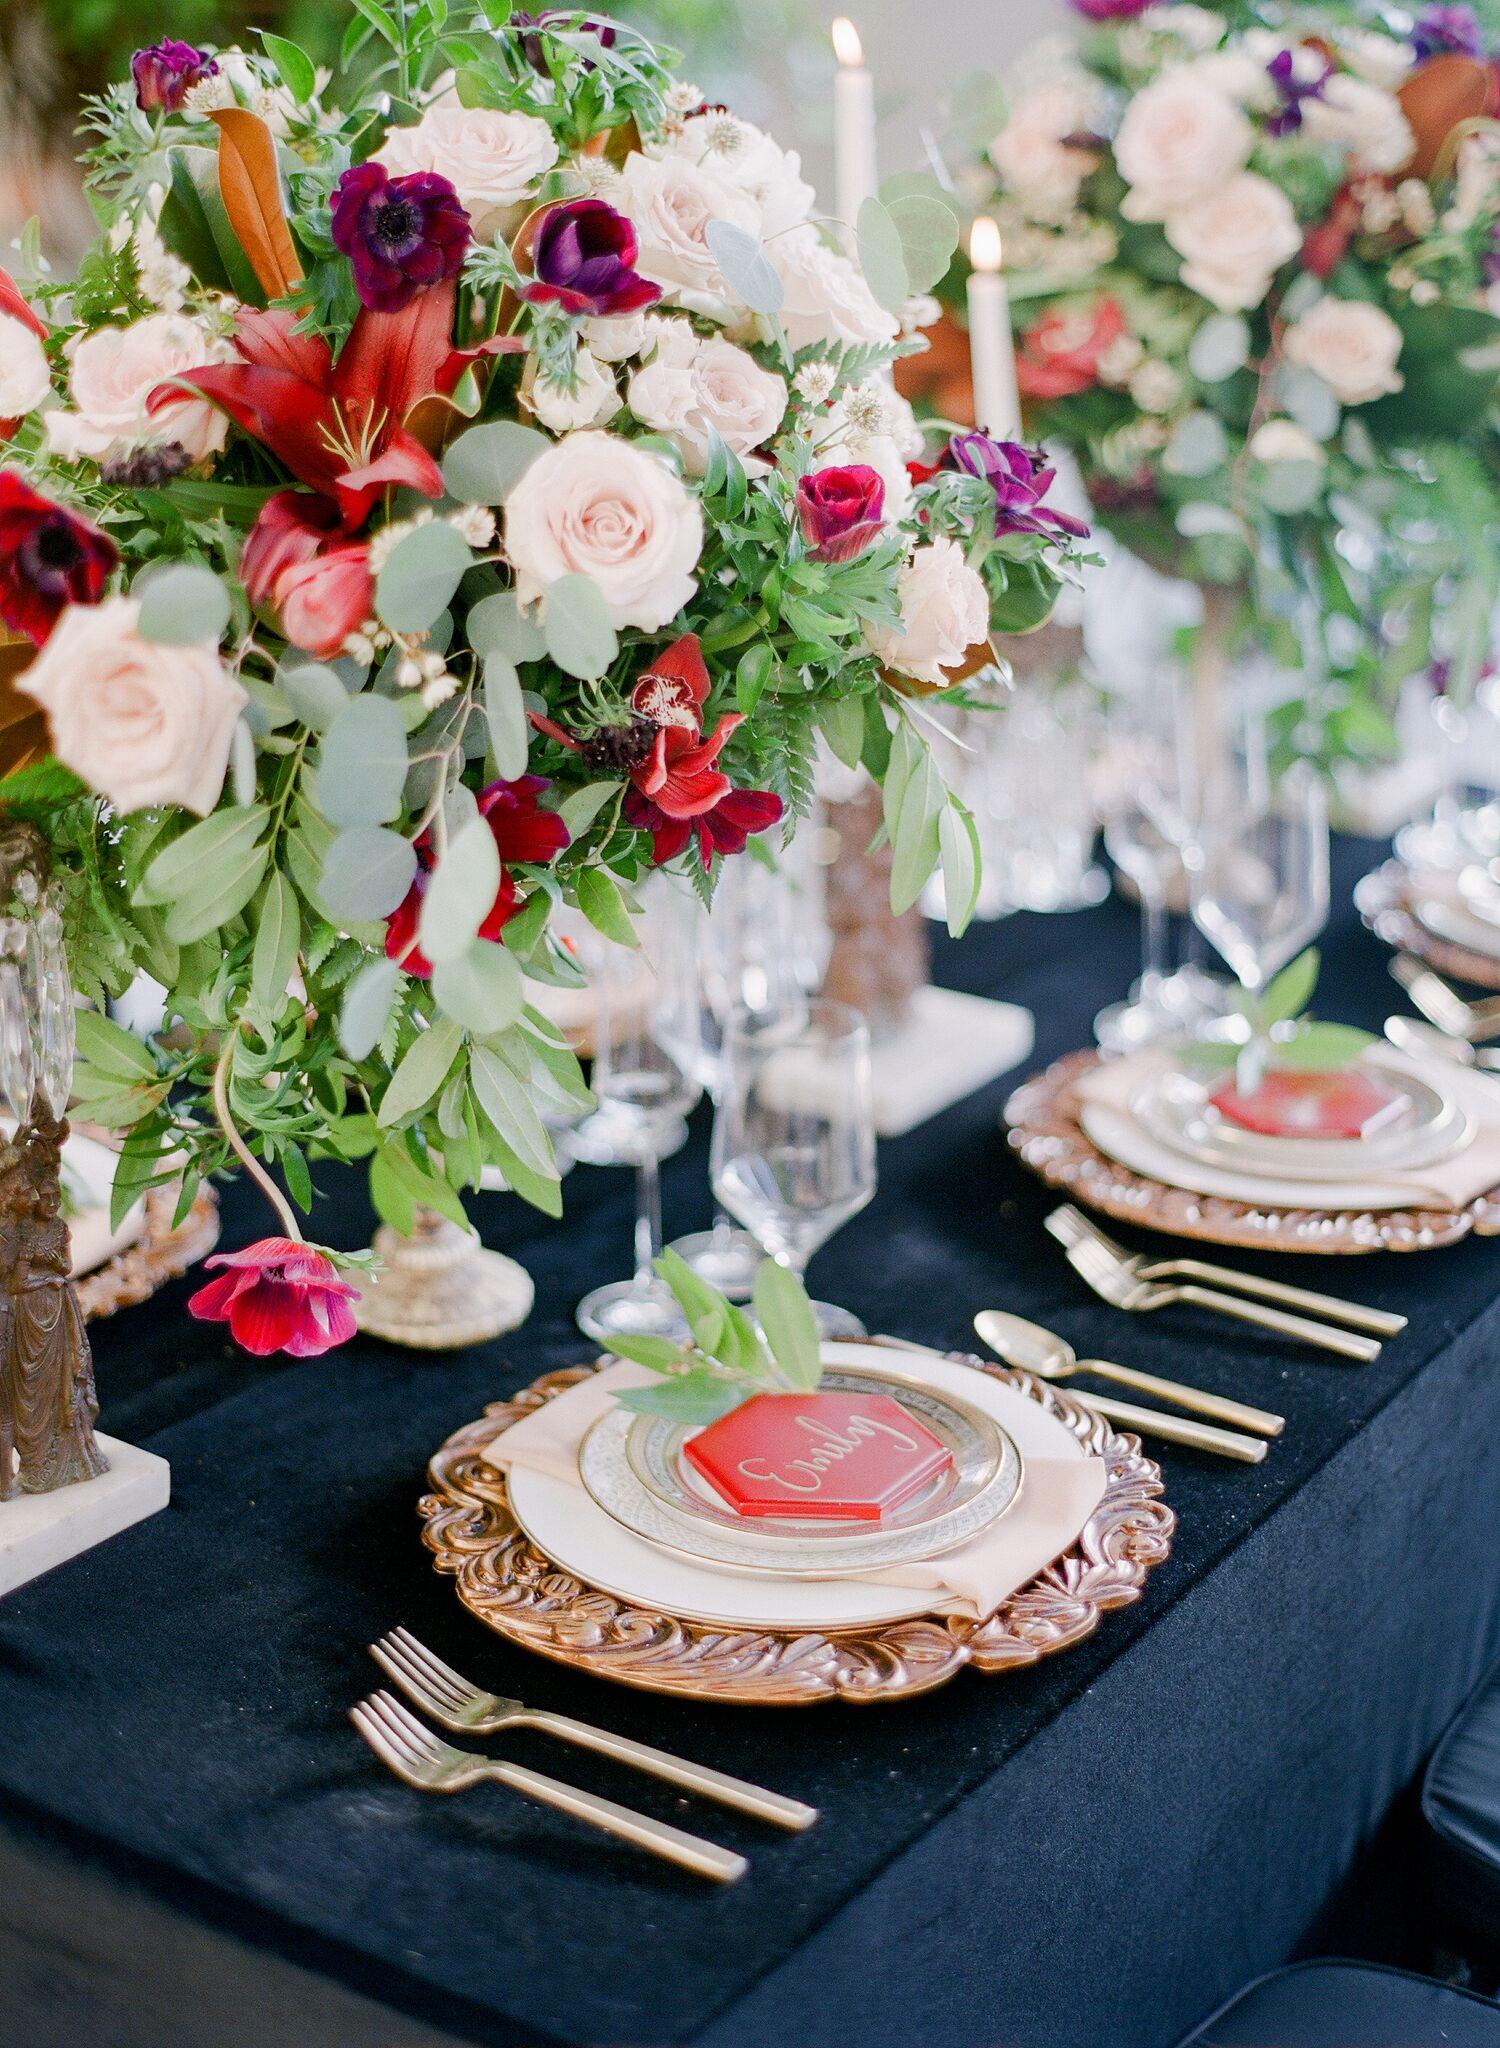 burlap-and-bordeux-steven-leyva-photography-villa-and-vine-wedding-styled-shoot-20_preview.jpg